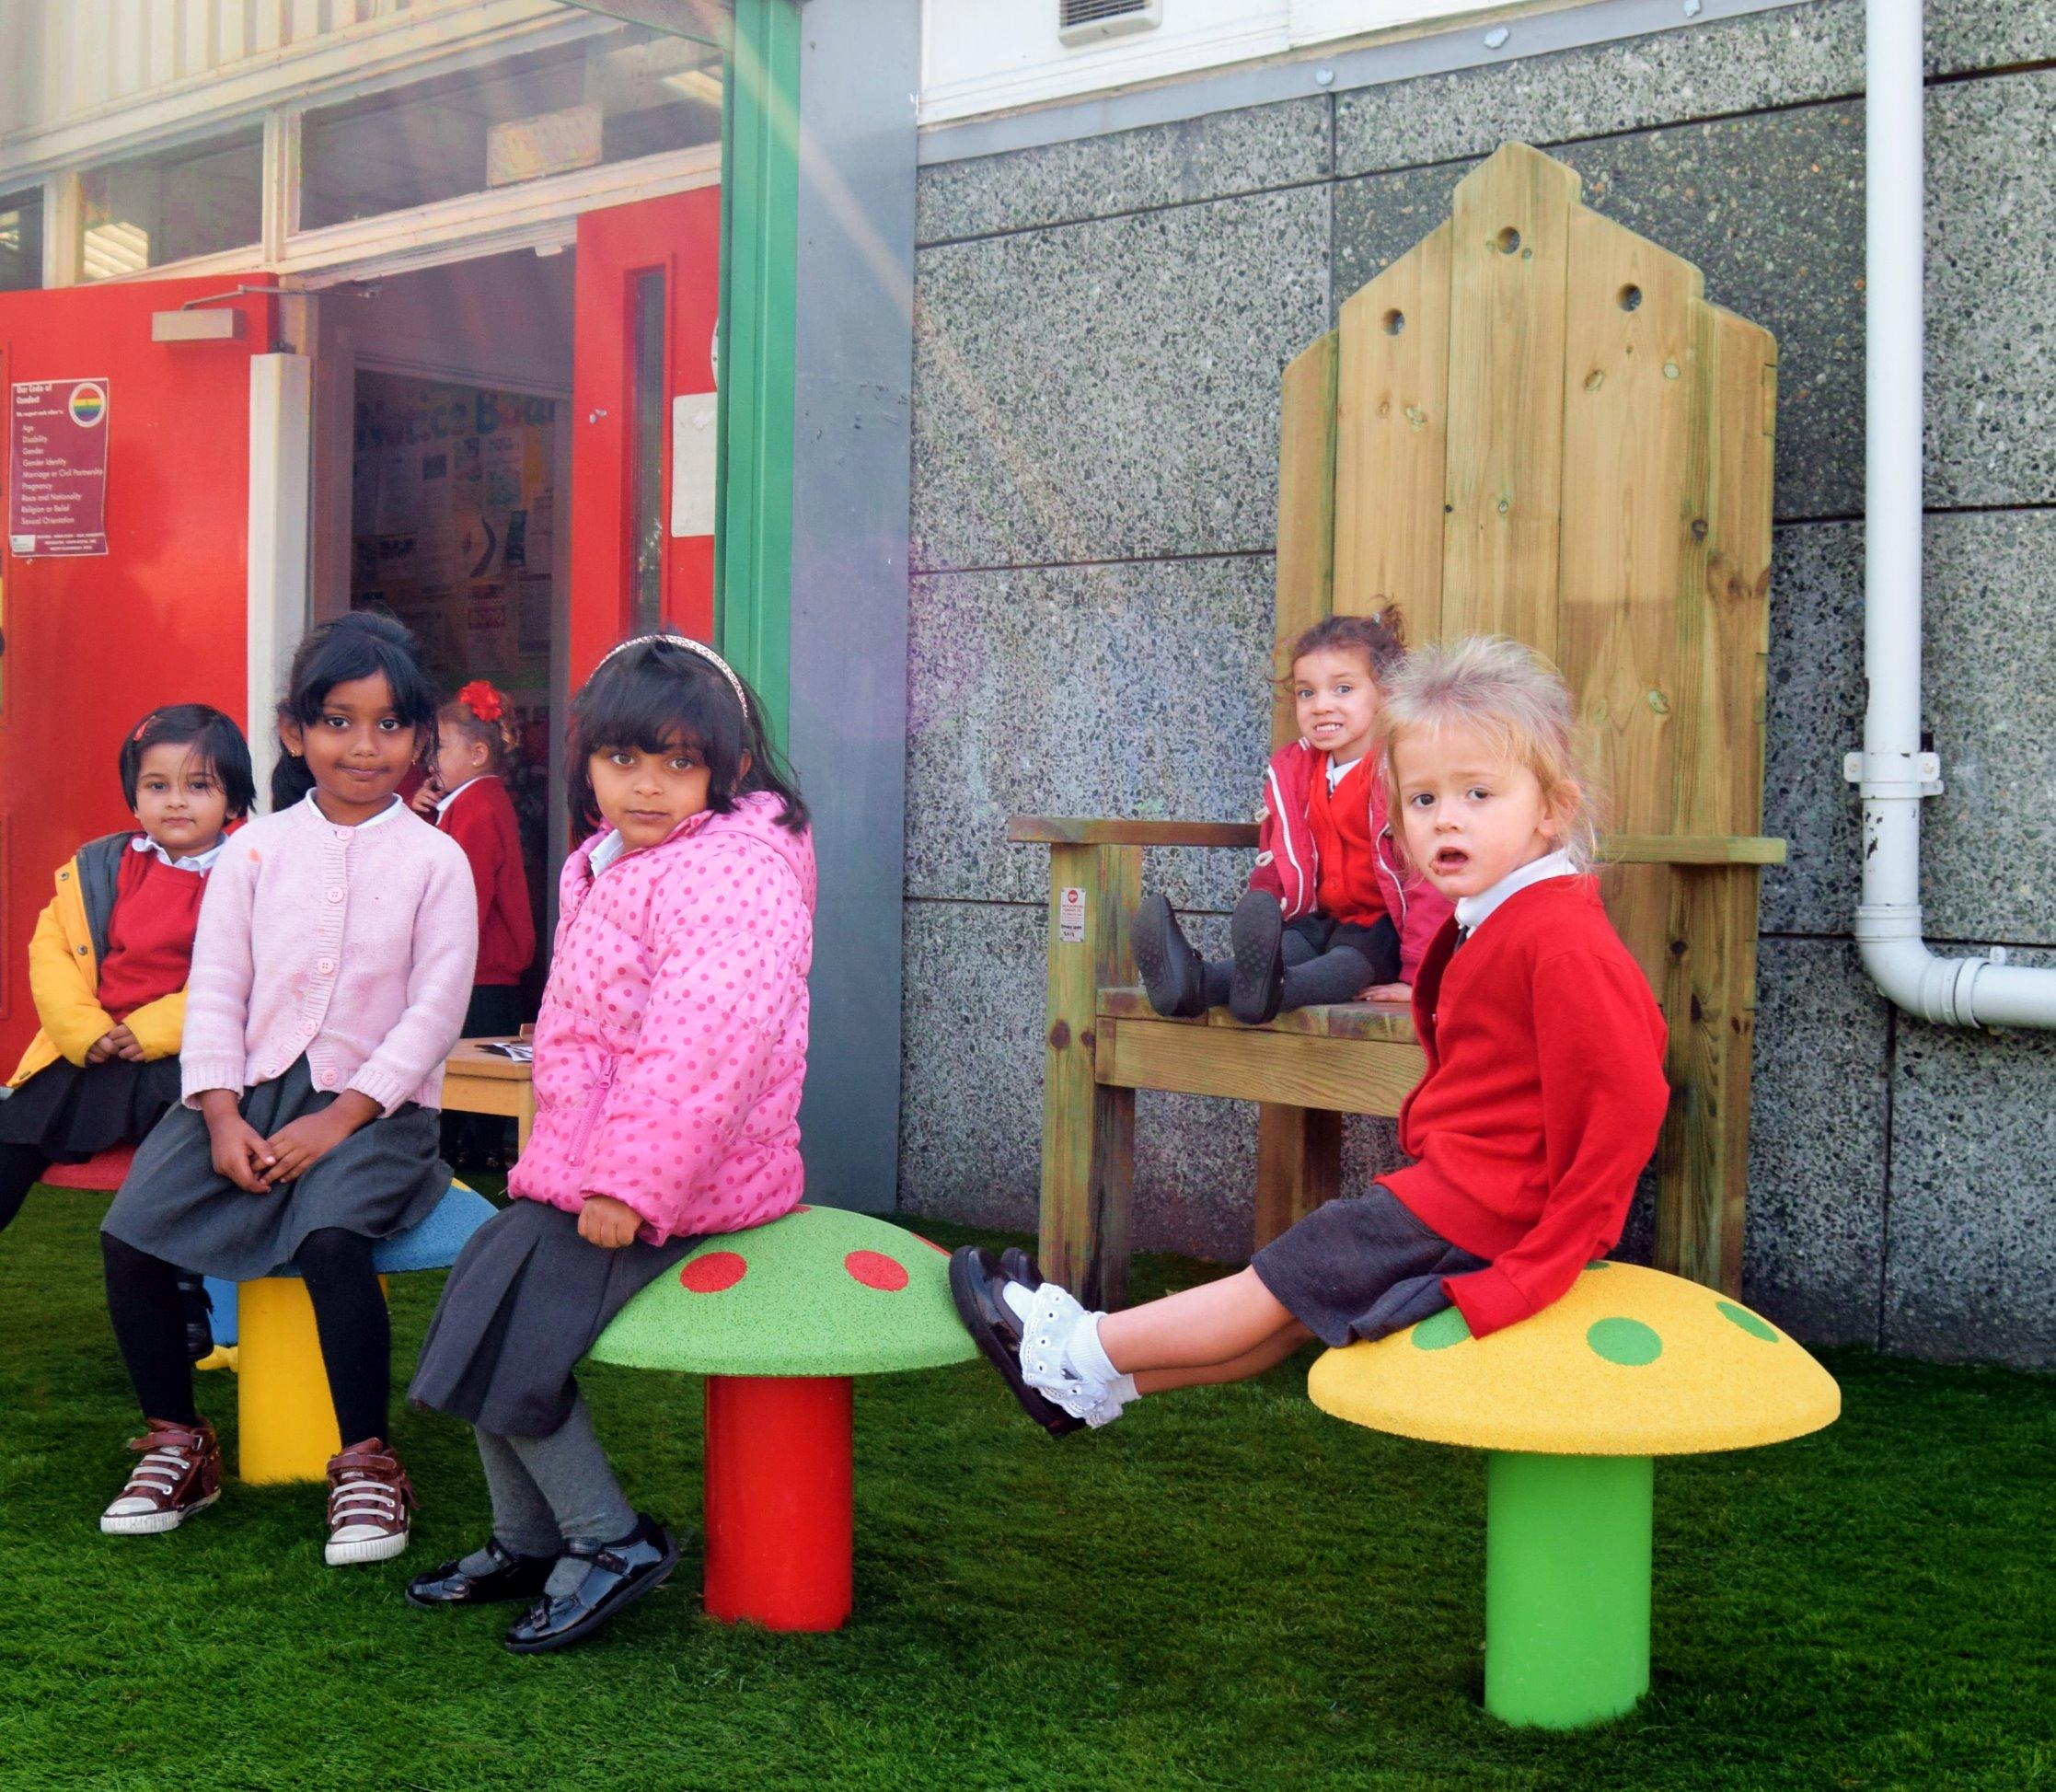 mushroom-seats-furniture-playgrounds-6_e